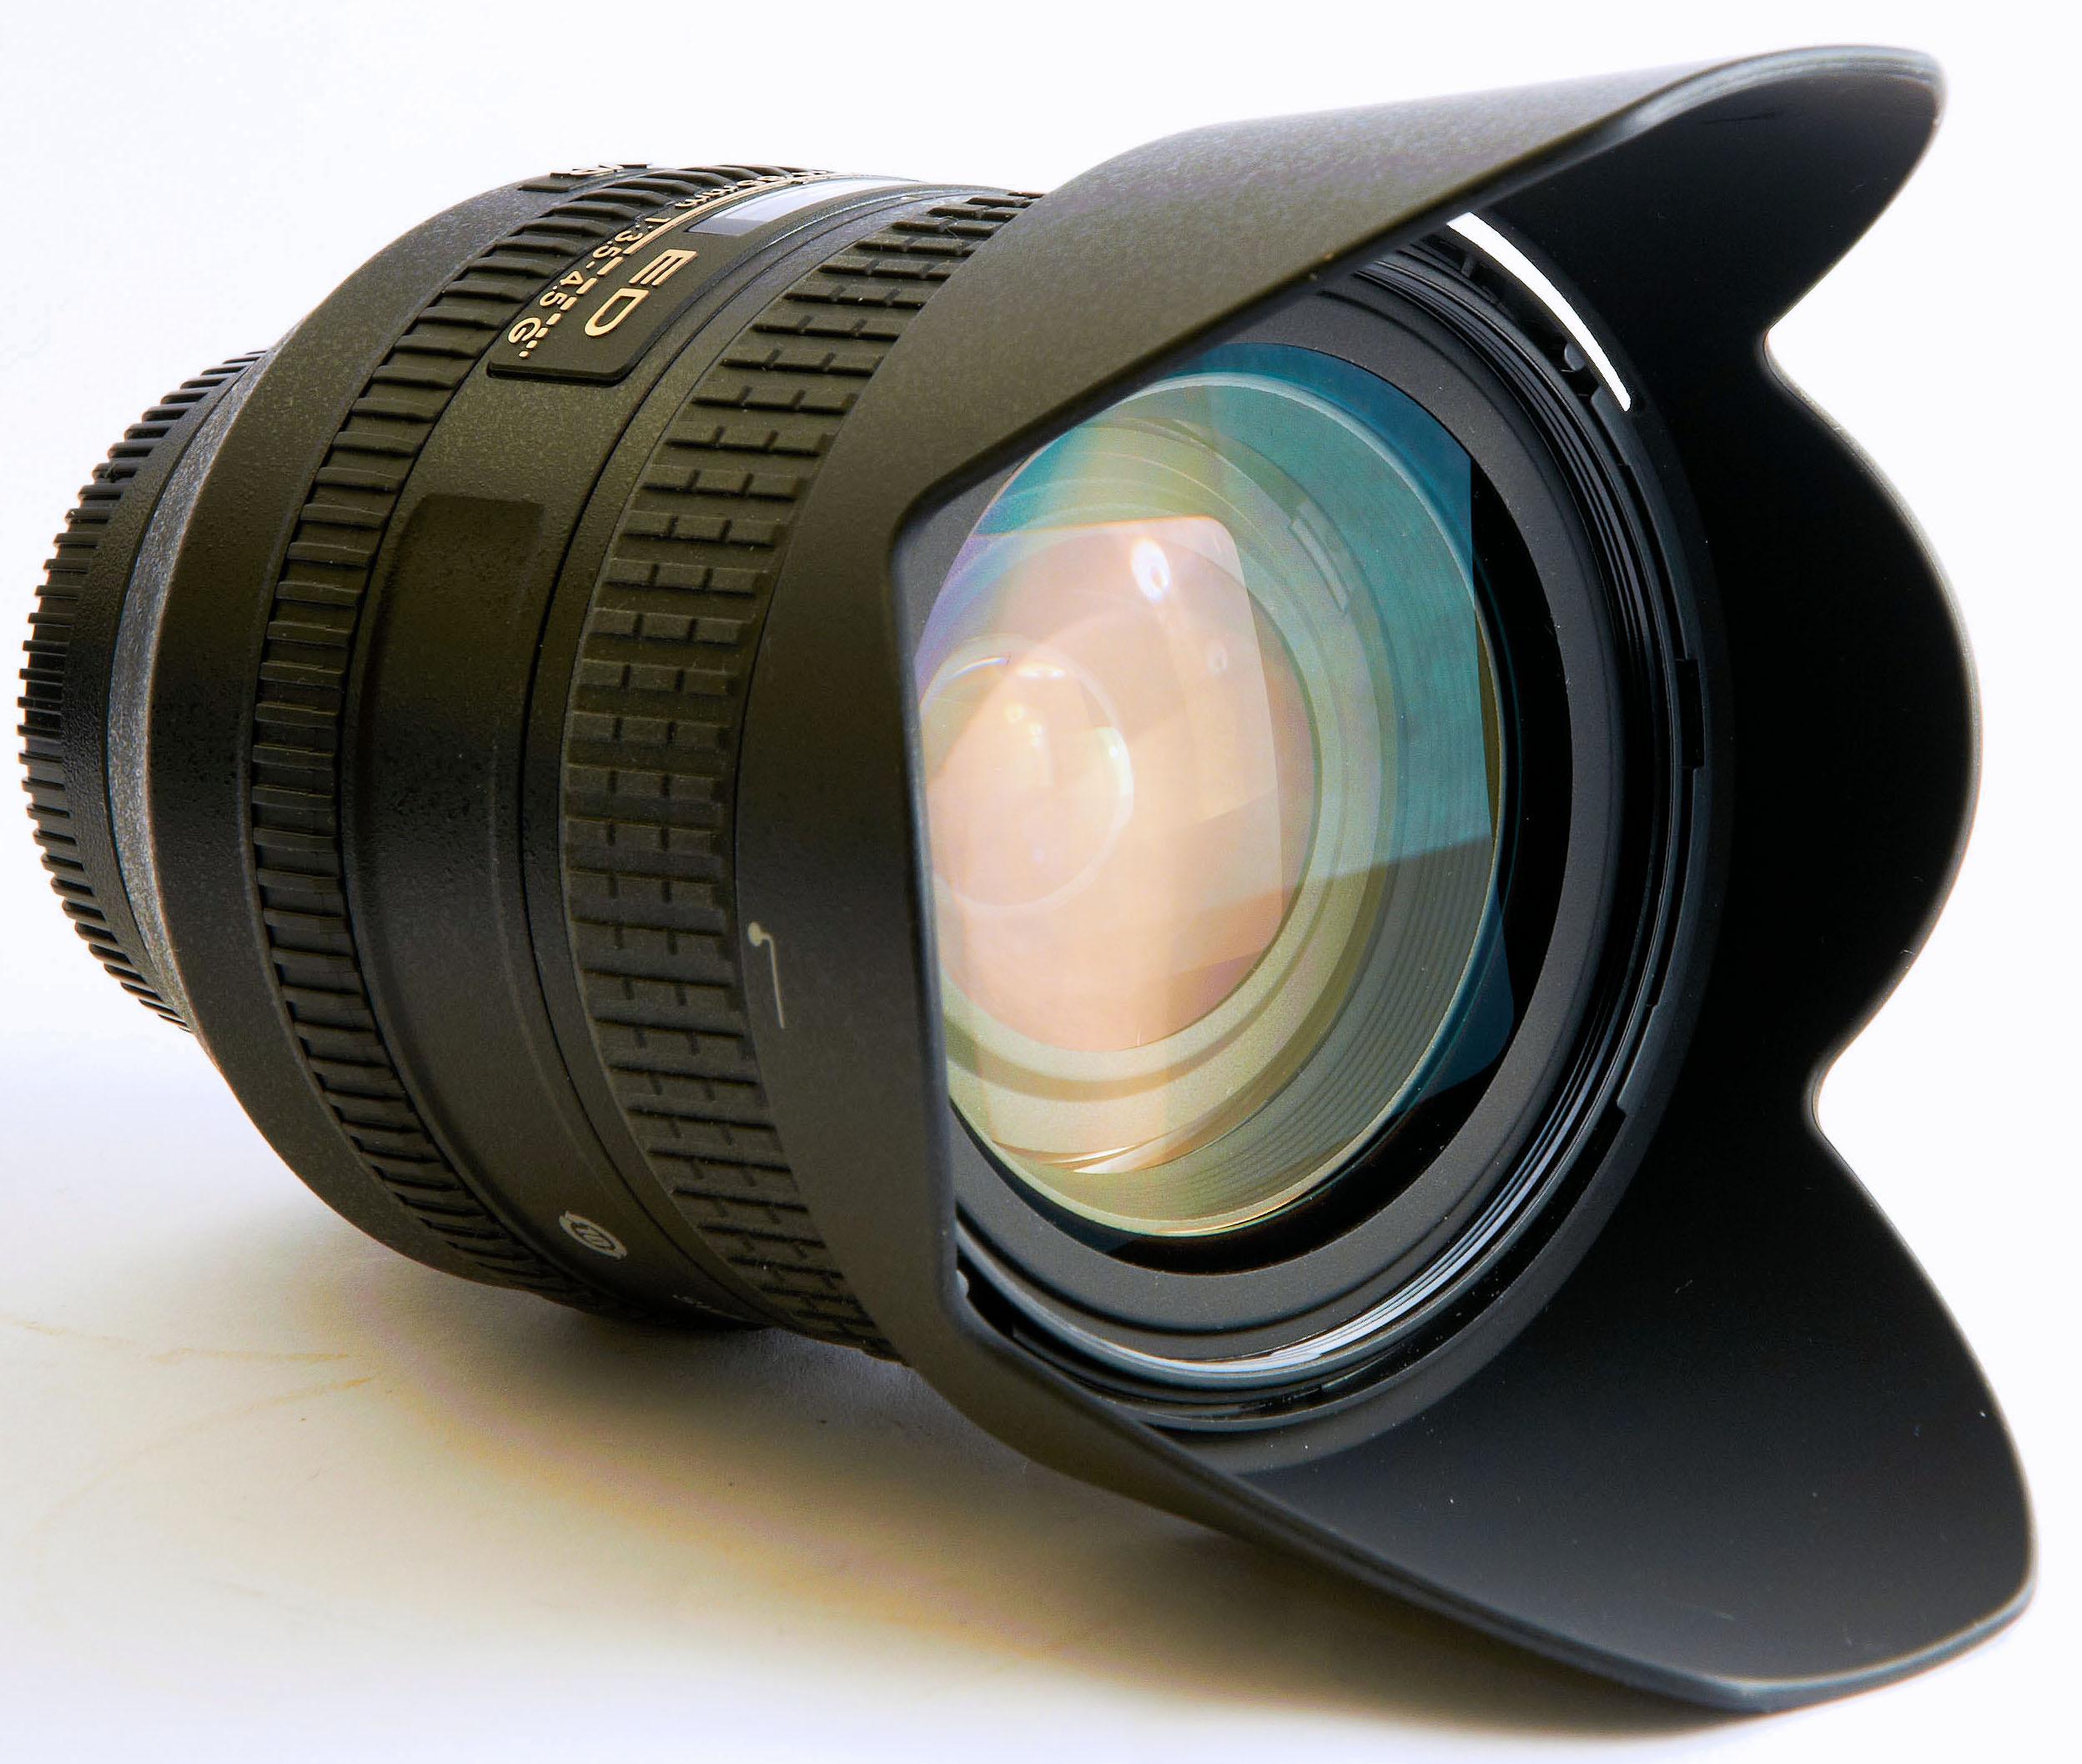 Camera Accessories Repair Lens Zoom iMotor Lens Rubber Ring for Nikon 24-85mm Generation 1 Focus Rubber Ring for Nikon 24-85mm Generation 1